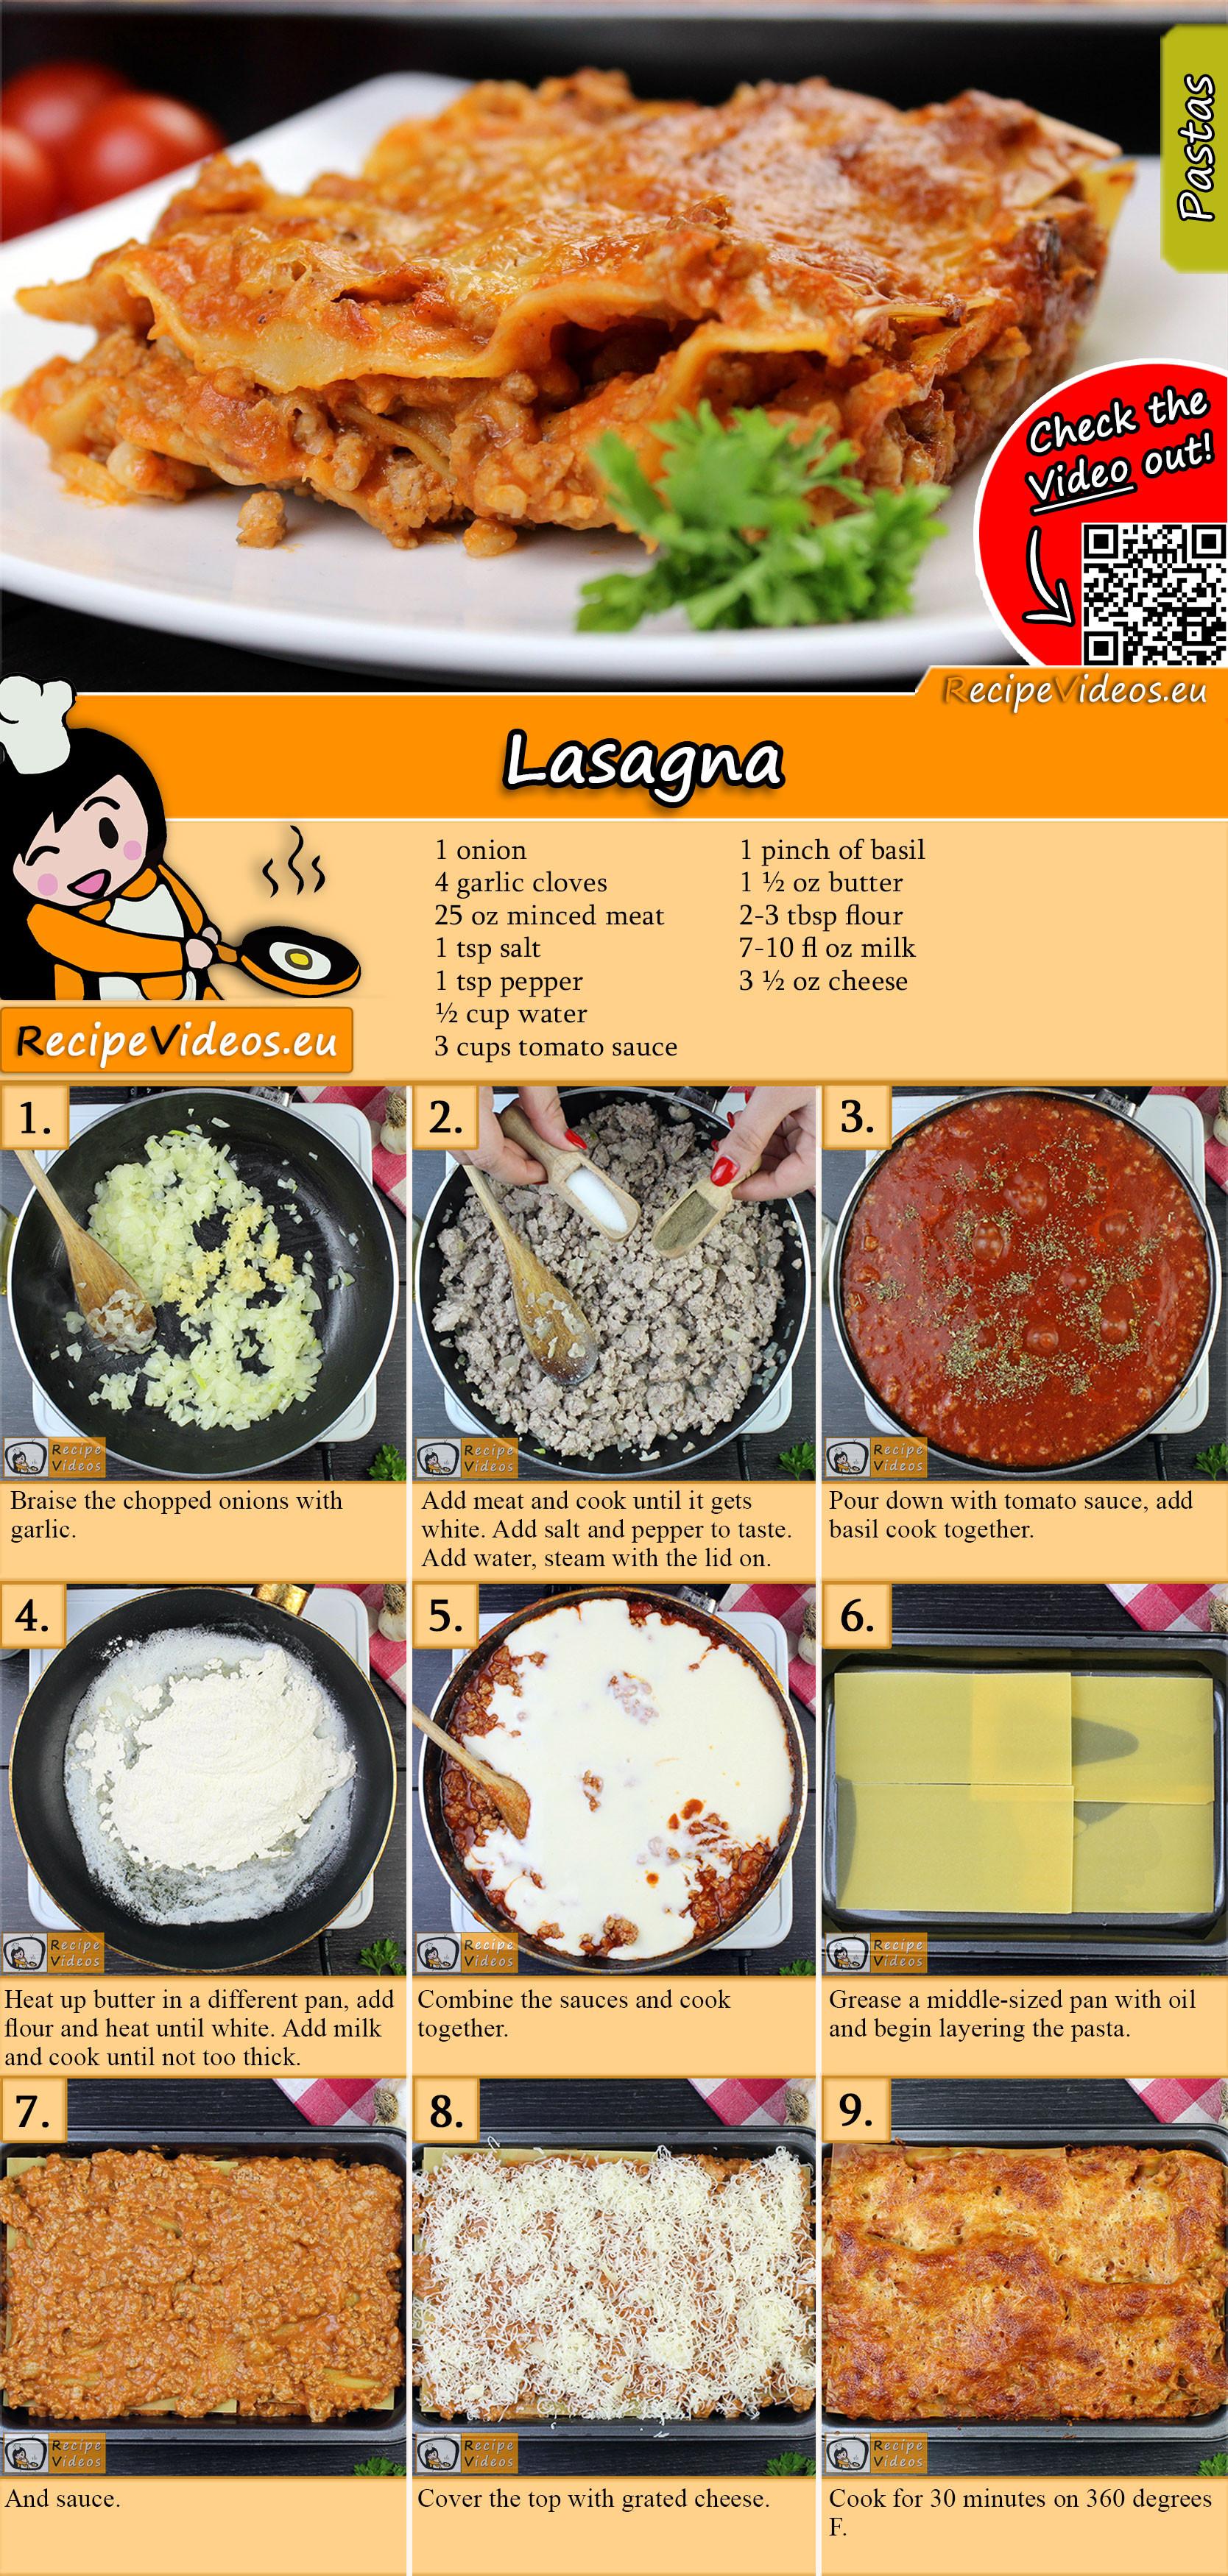 Lasagna recipe with video